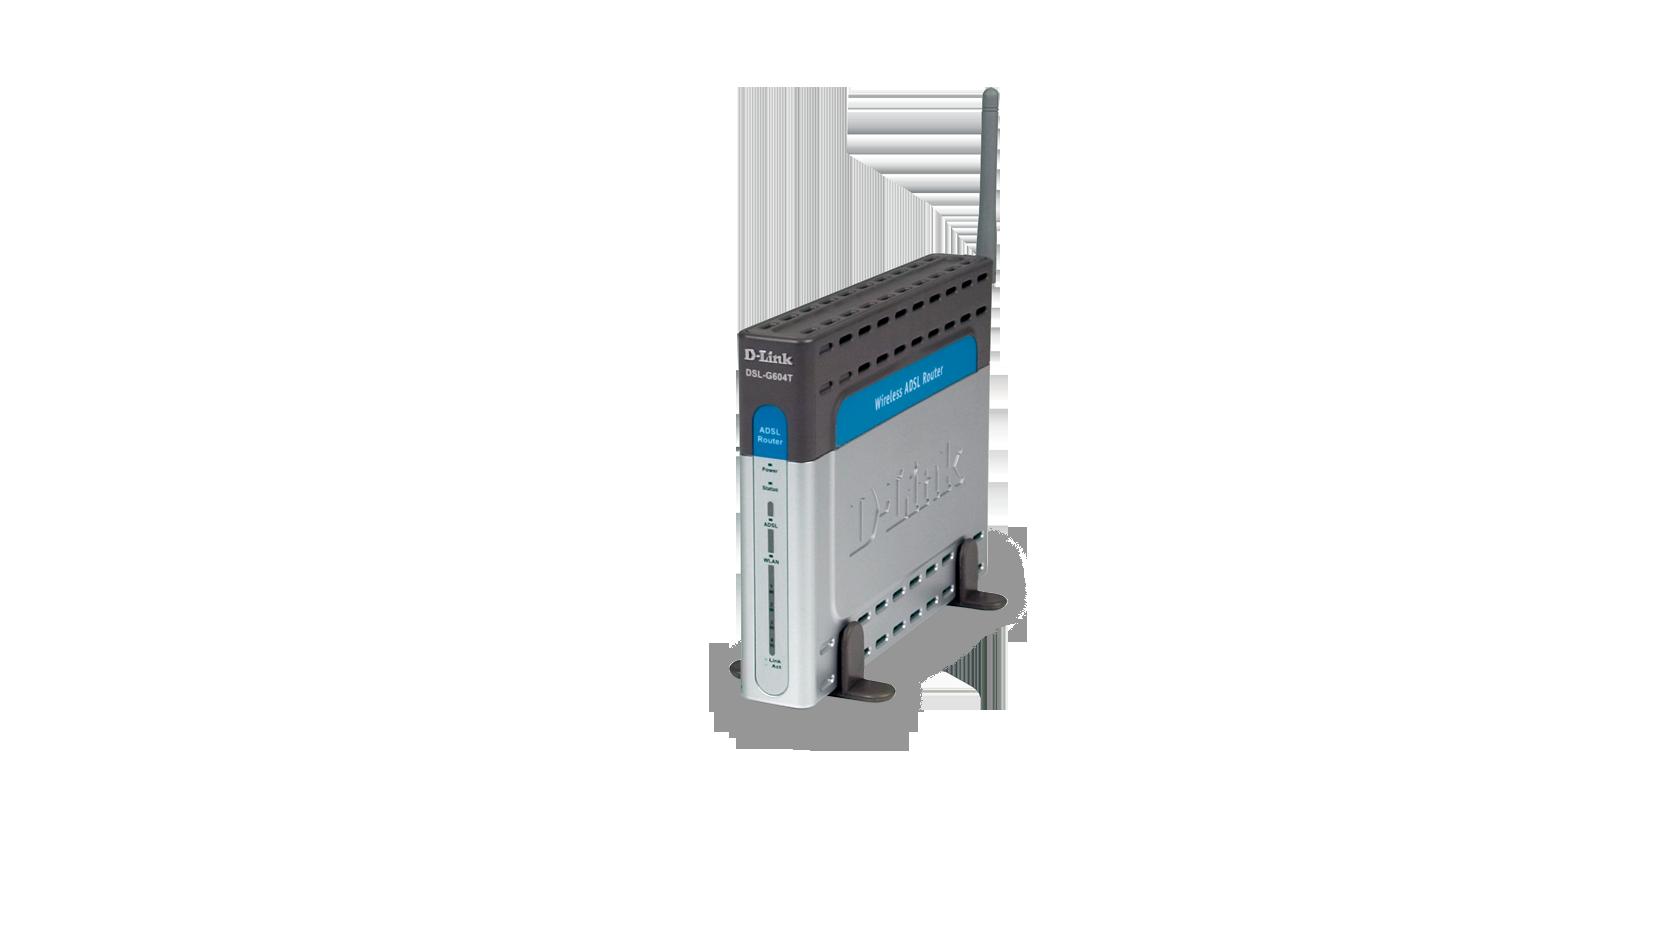 D LINK DSL-G604TEU DRIVER FOR WINDOWS 10